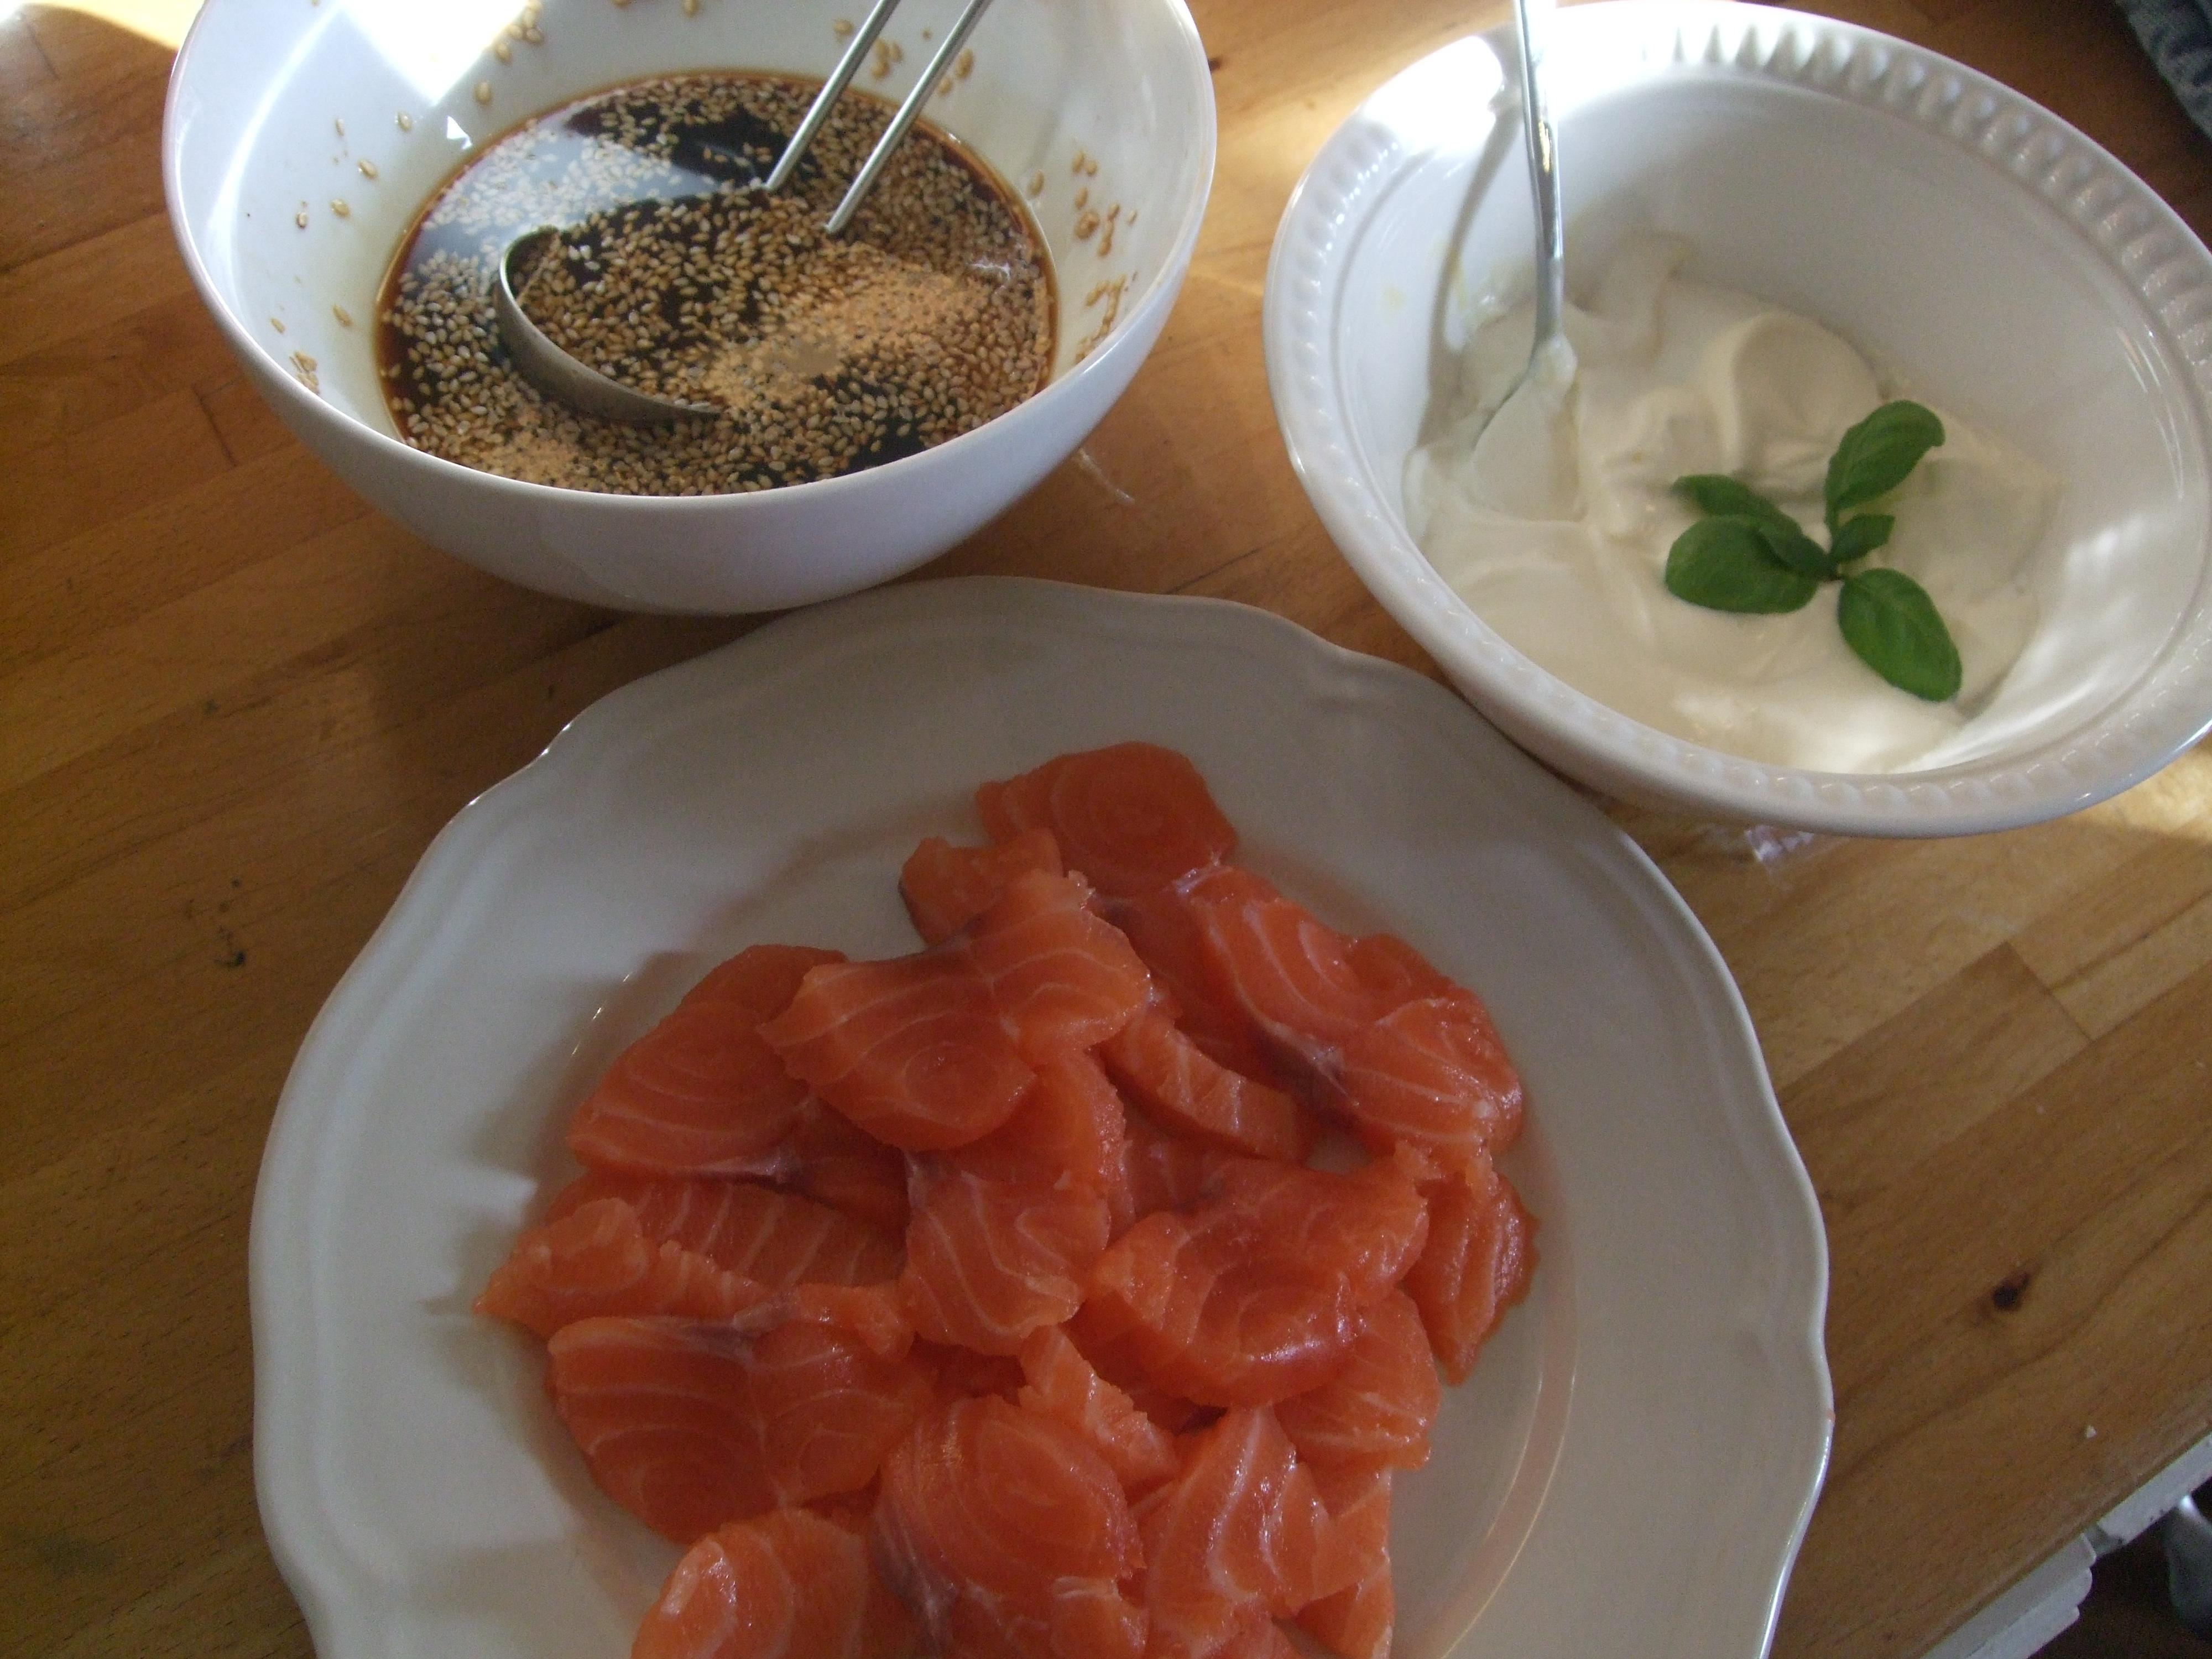 Hver sommer får jeg sushi hos Benedicte og Jørgen, med en fantastisk saus som Jørgen lager. Jeg husker ikke helt hva som er i den, så derfor laget jeg min […]